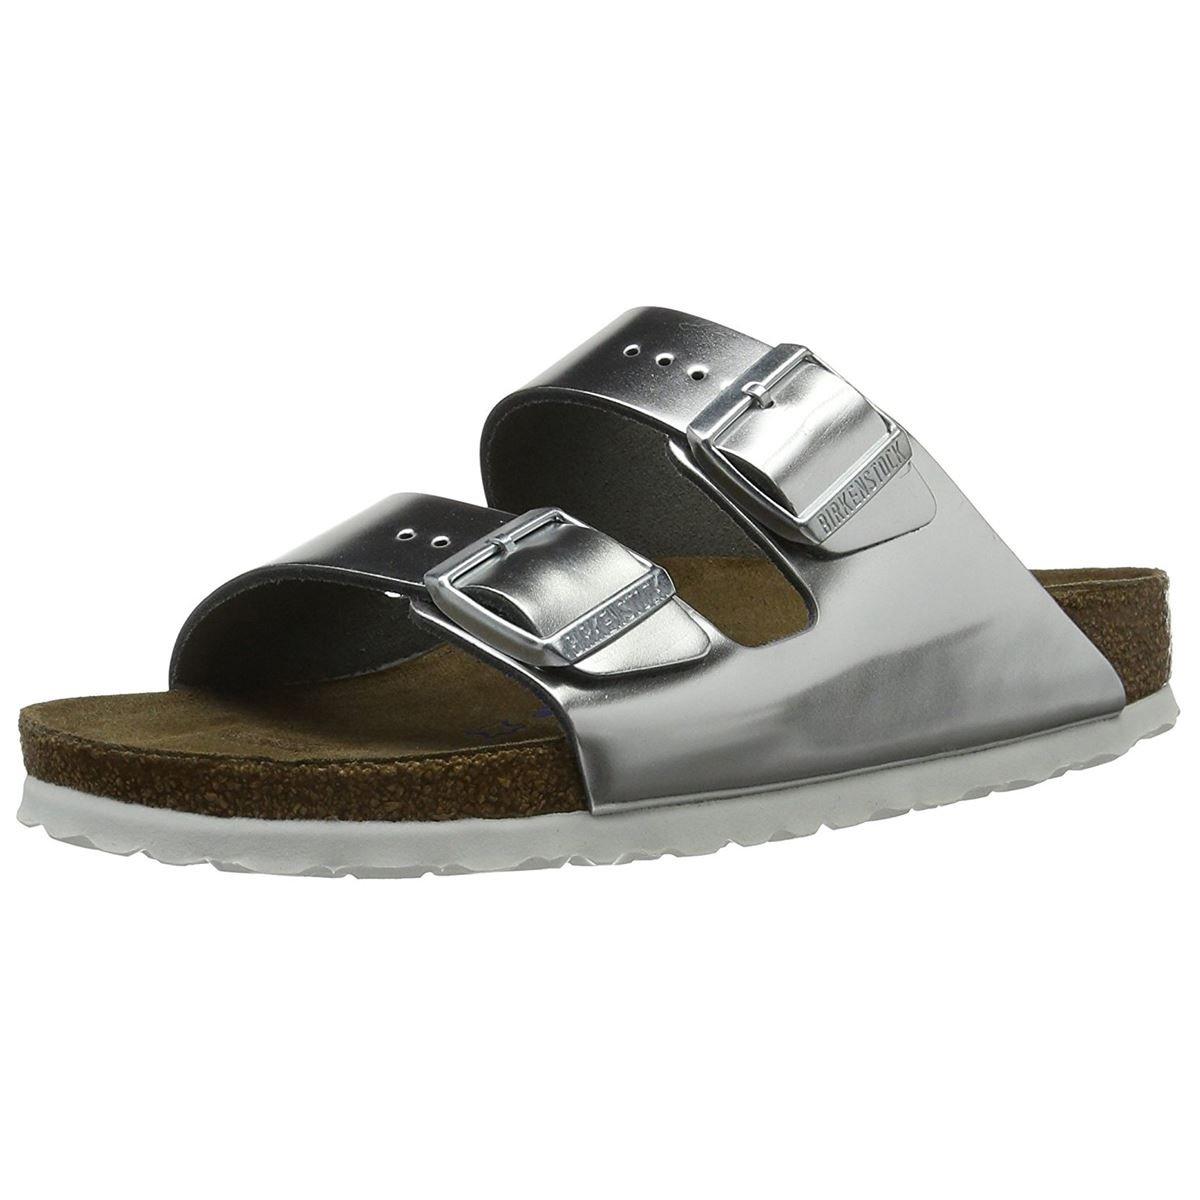 Birkenstock Arizona Metallic Silver Soft Footbed Leather Sandal 39 N (US Women's 8-8.5)